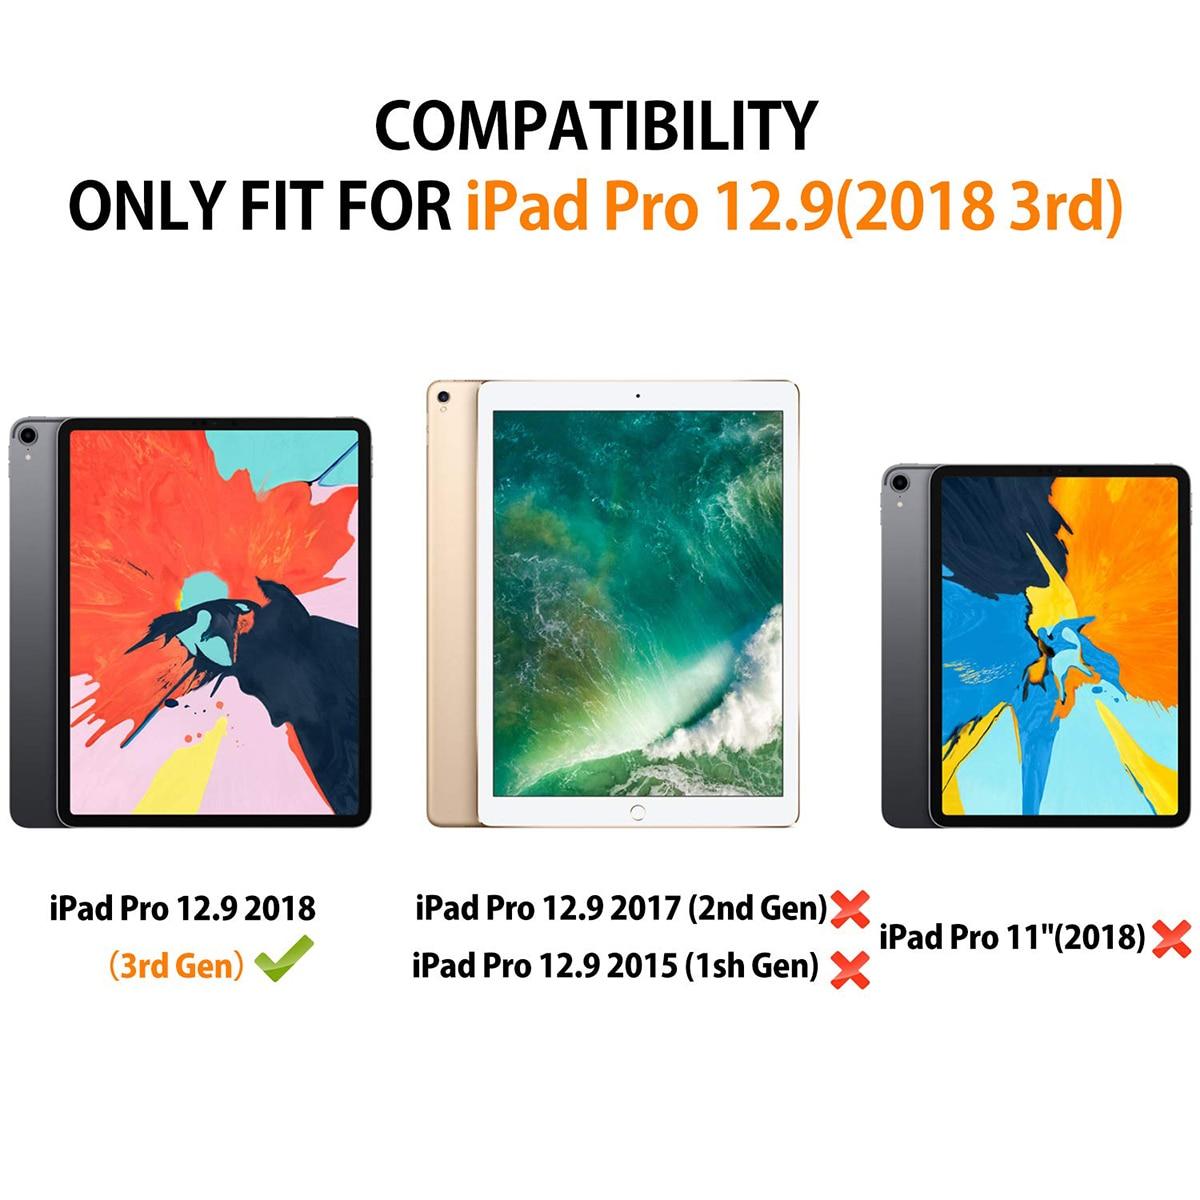 For iPad Pro 2018 12.9